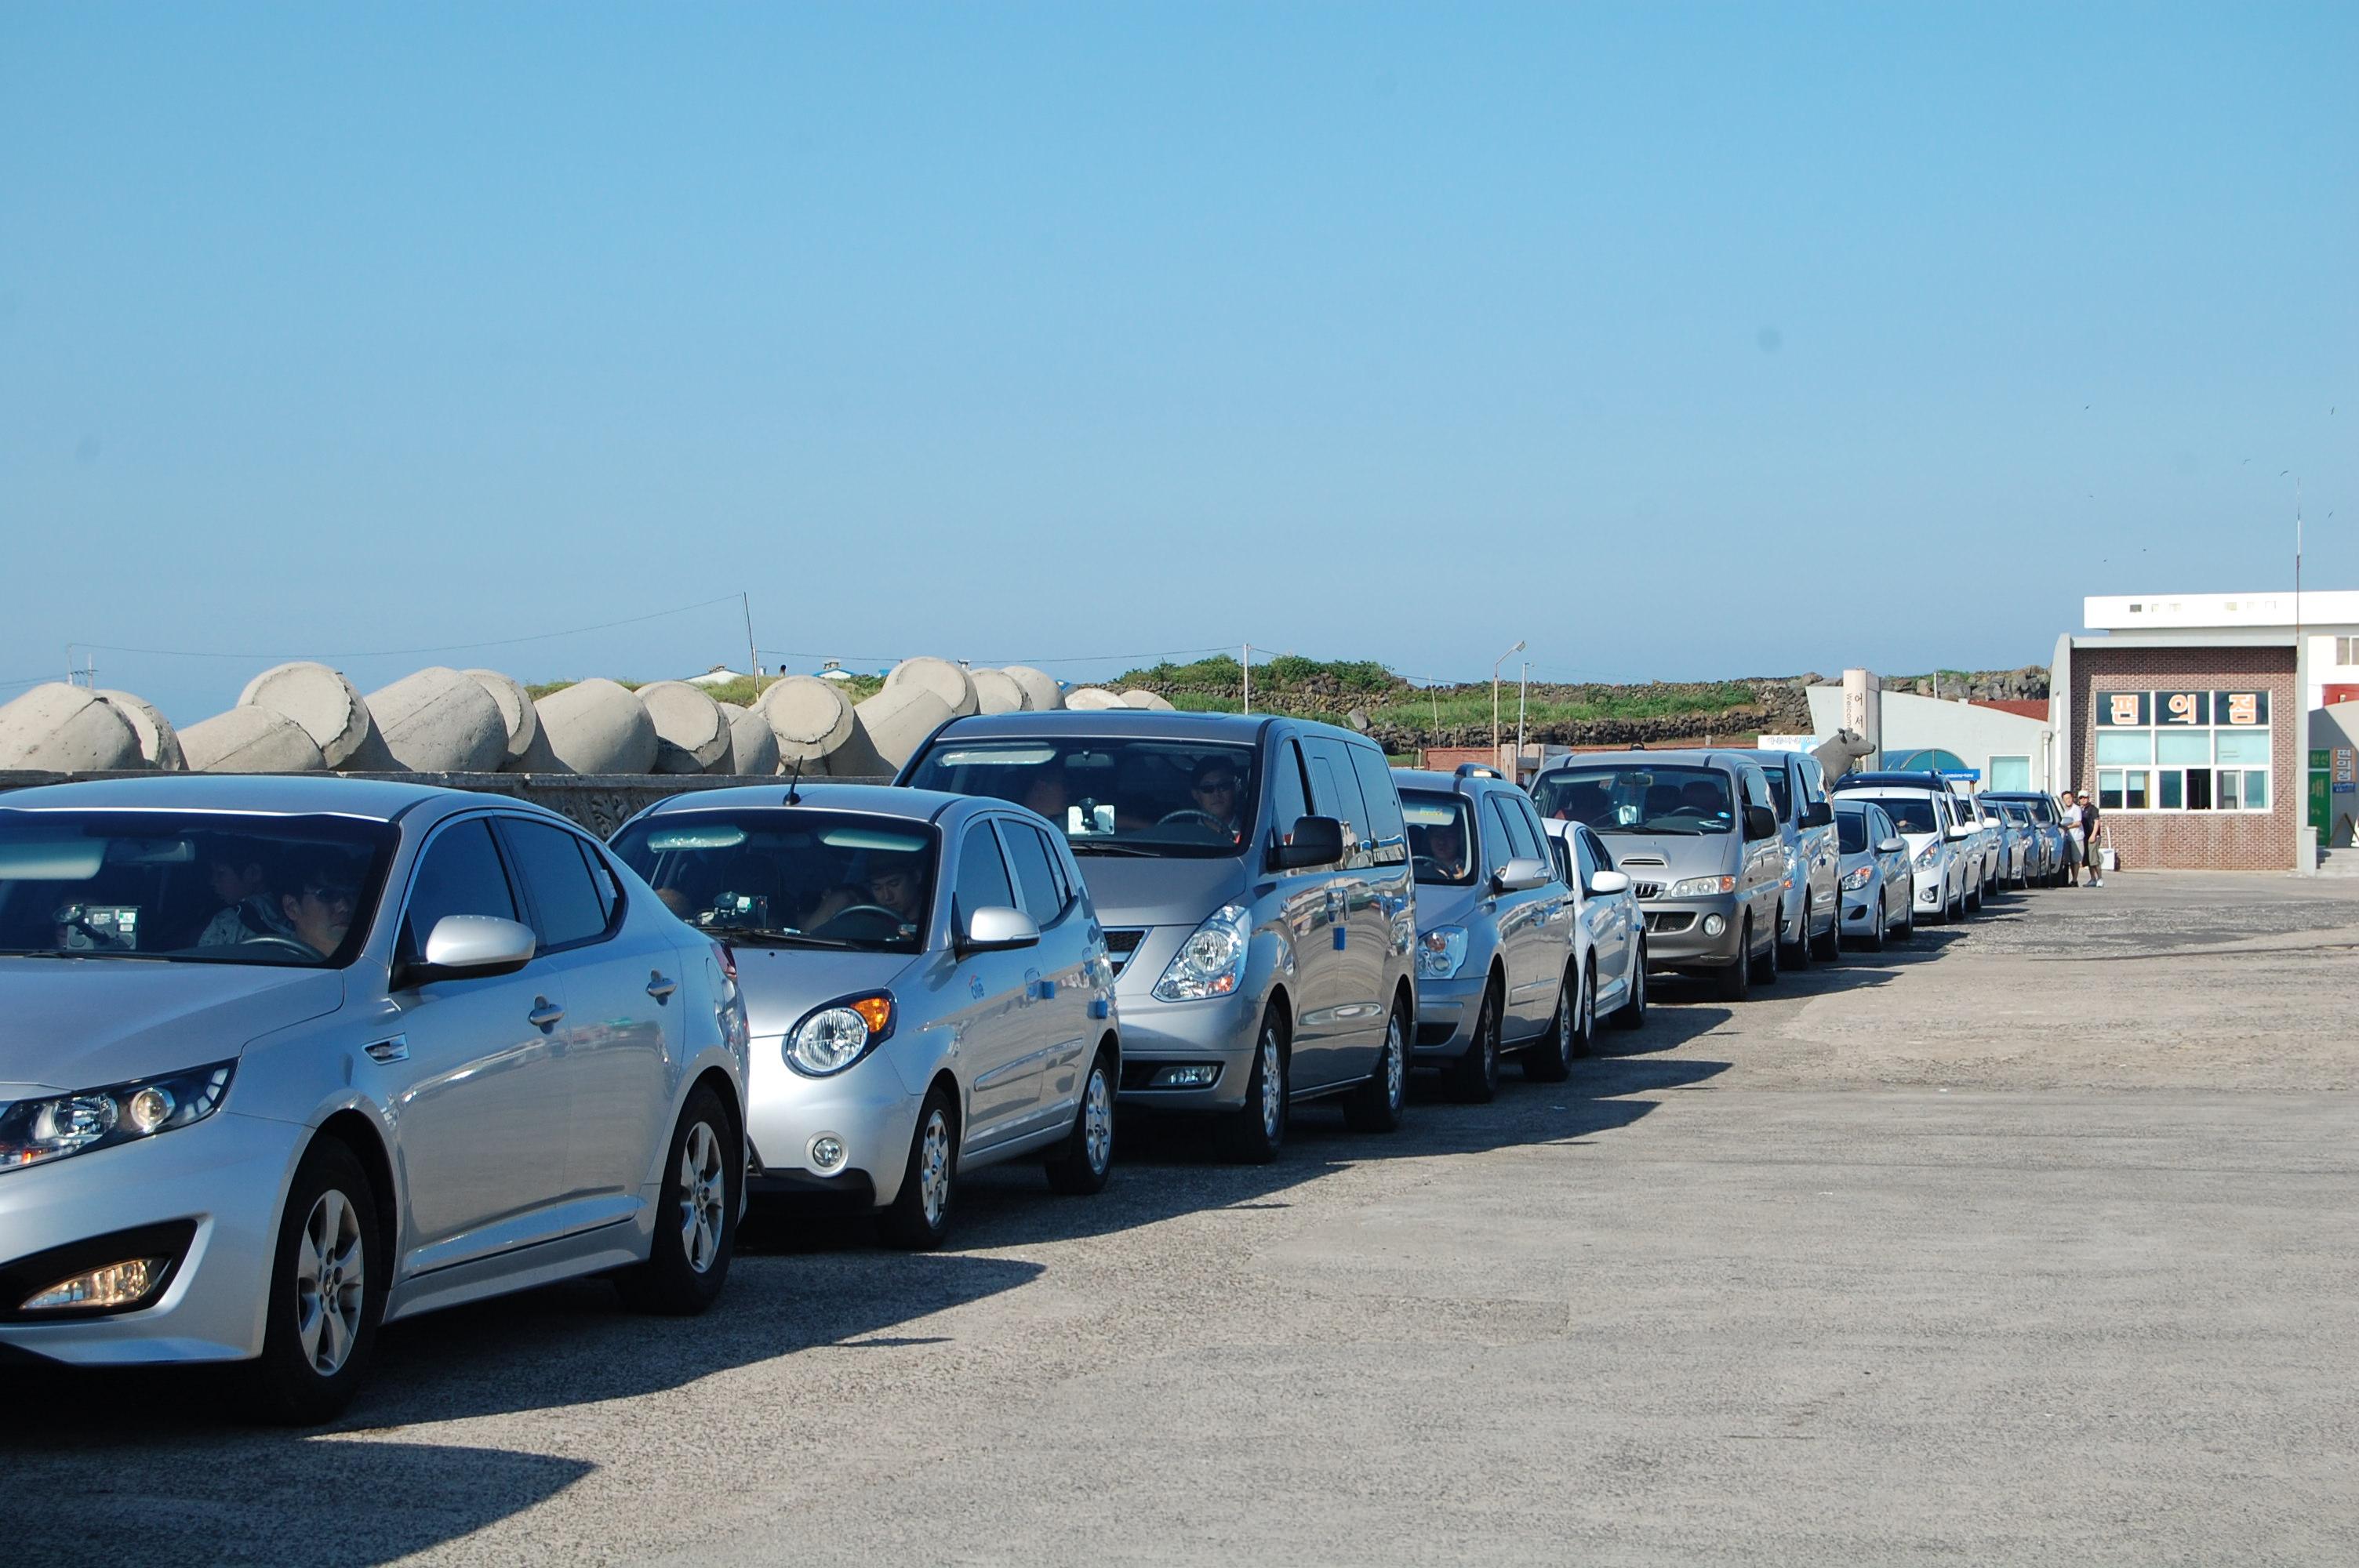 Line of same-colored Korean cars